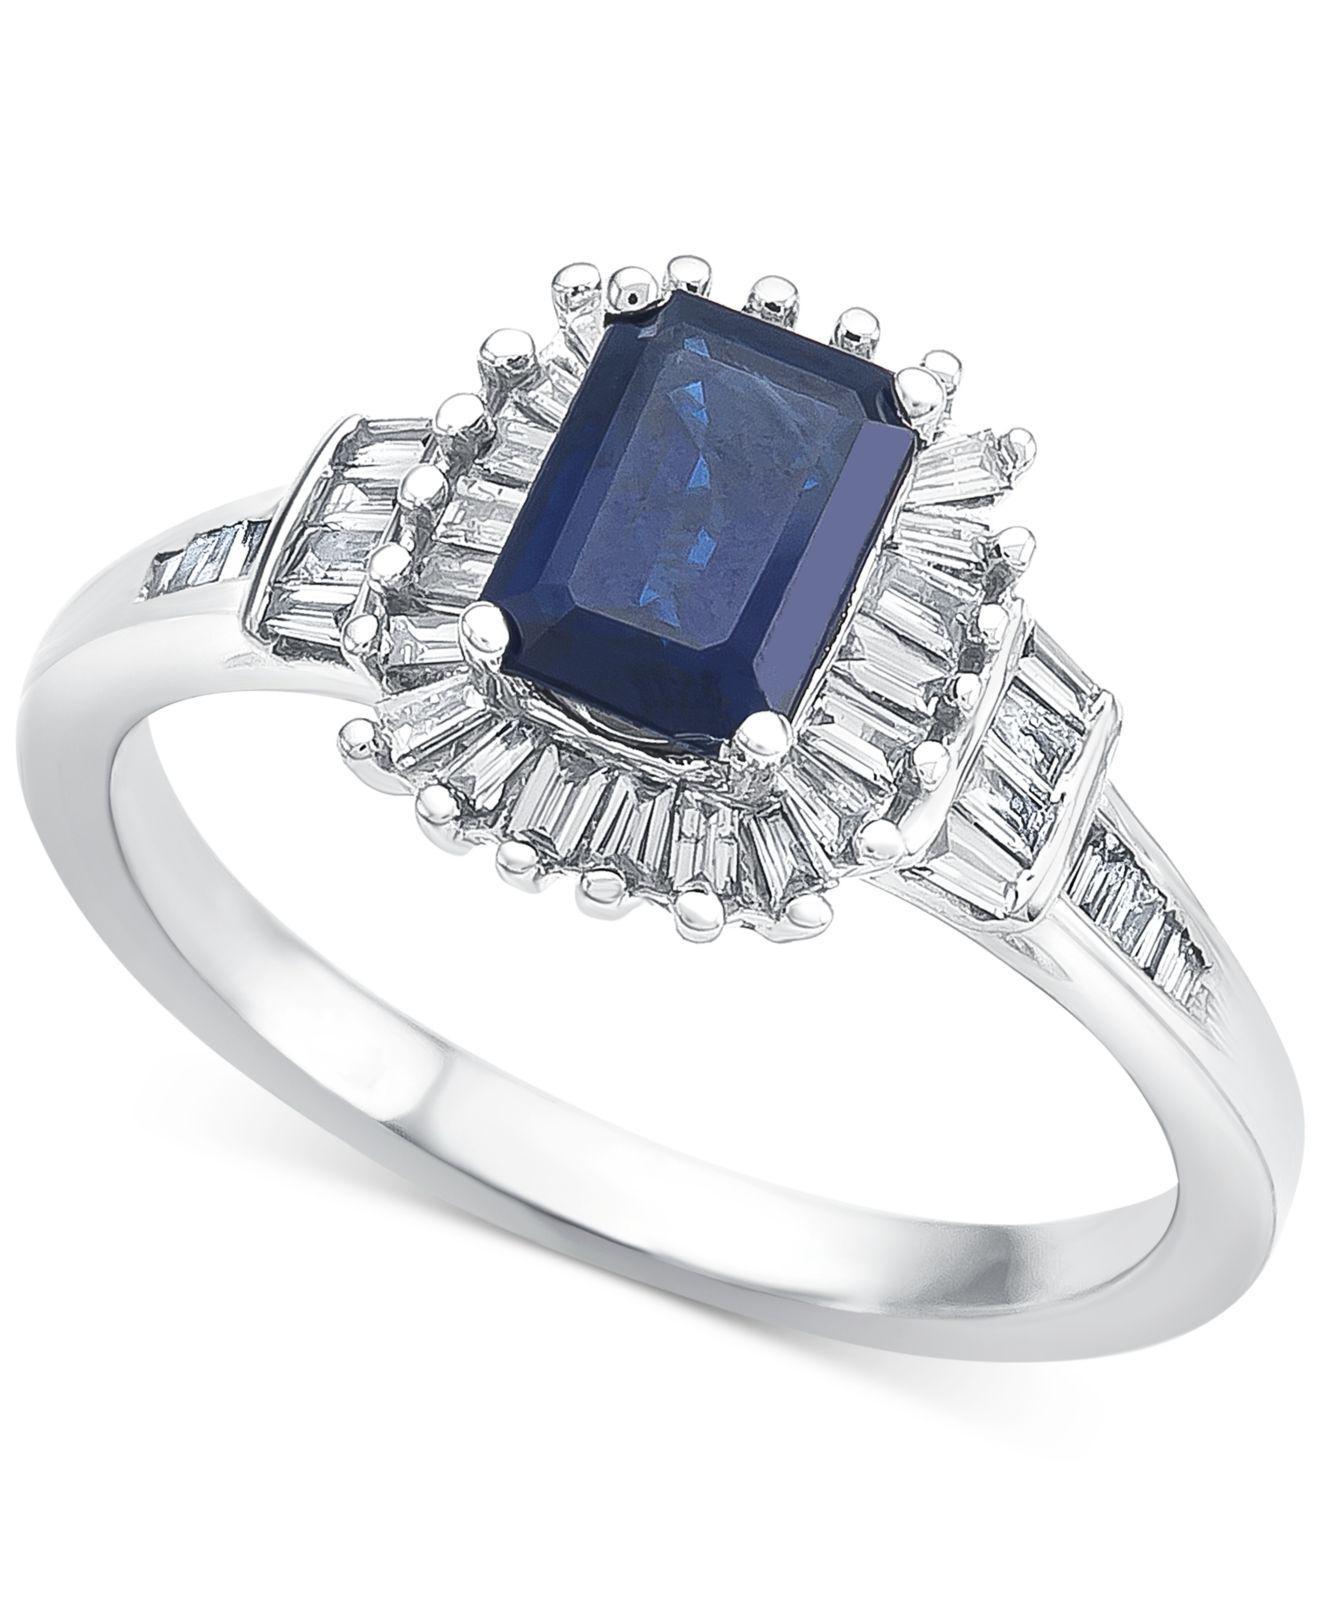 80c502bec Lyst - Macy's Sapphire (1 Ct. T.w.) & Diamond (1/3 Ct. T.w.) In 14k ...